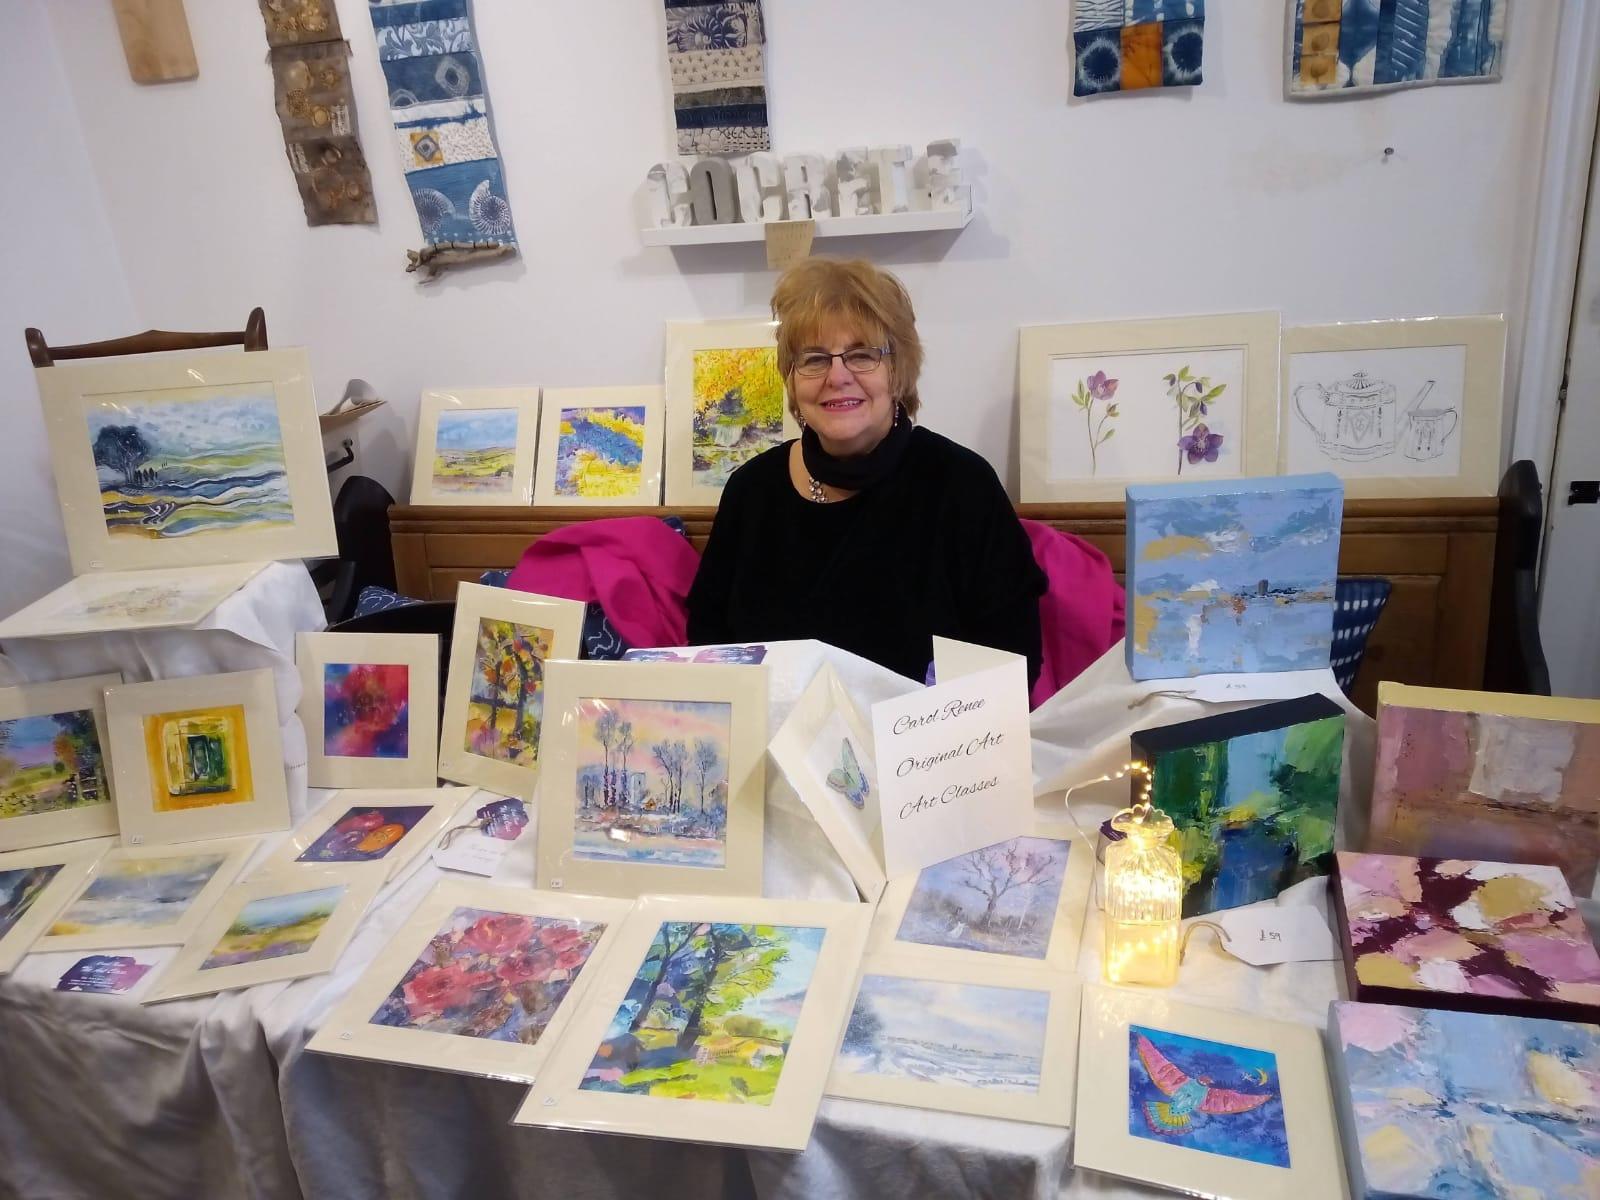 Carol Renee art